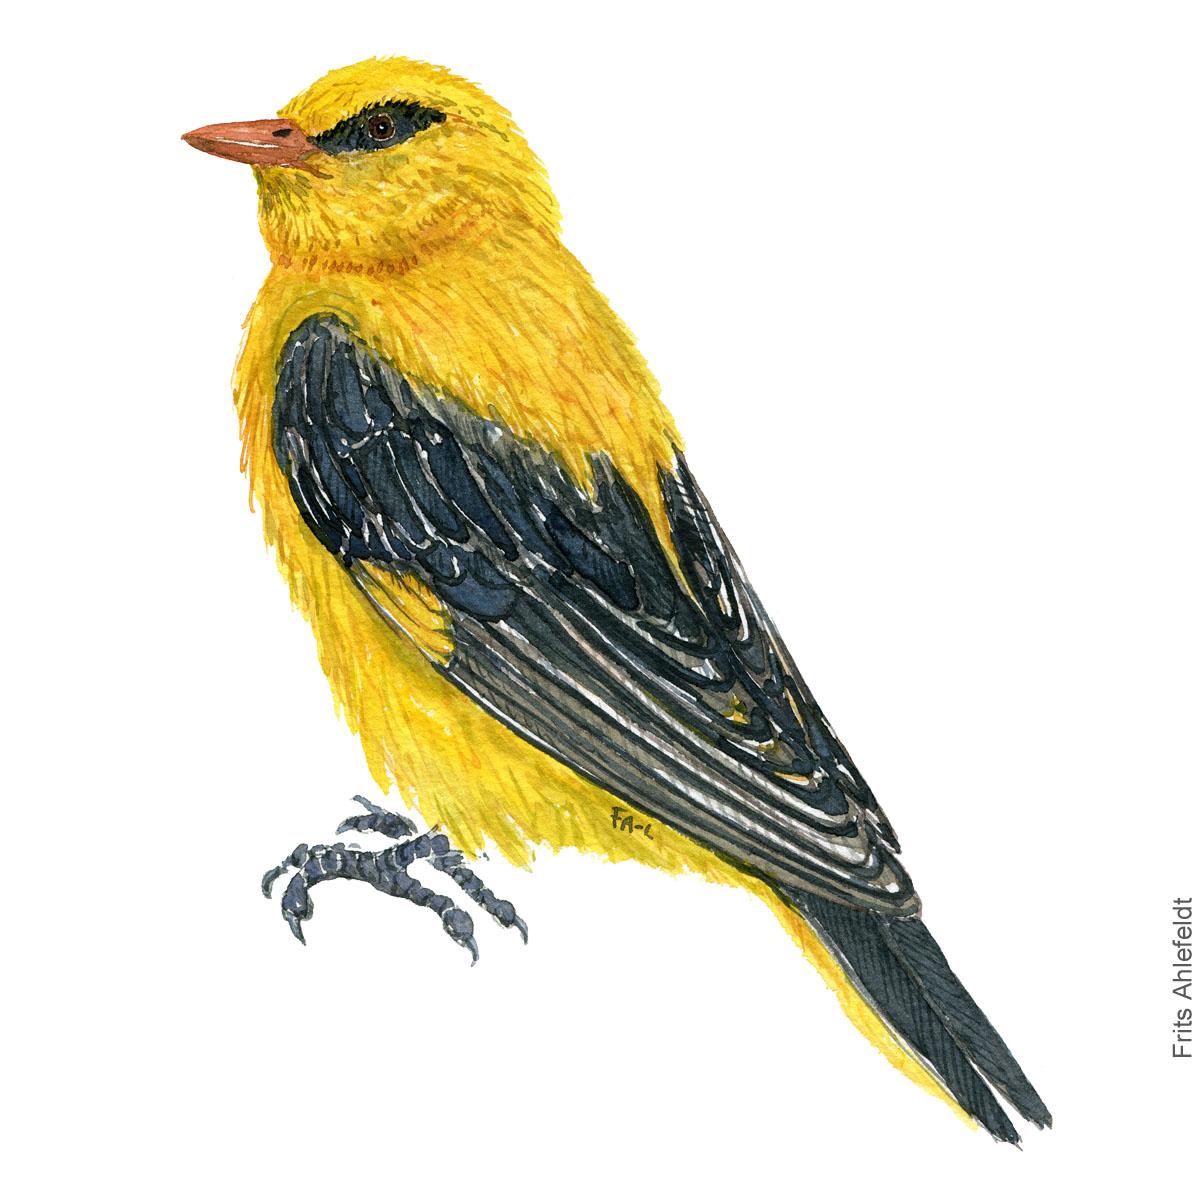 Pirol - Eurasian golden oriole Haerfugl - Eurasian Hoopoe bird watercolor illustration. Painting by Frits Ahlefeldt. Fugle akvarel